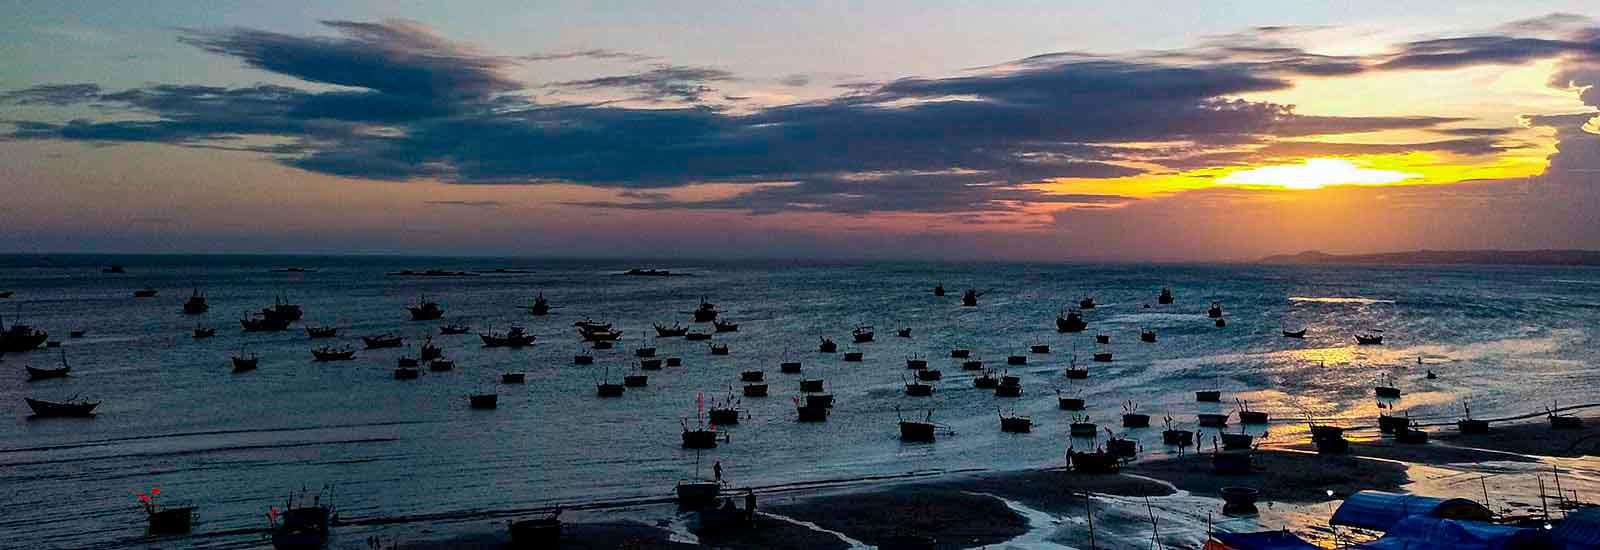 TEAMBRENNER Bildreise Vietnam Mui Ne Ne Cape Sonnenuntergang